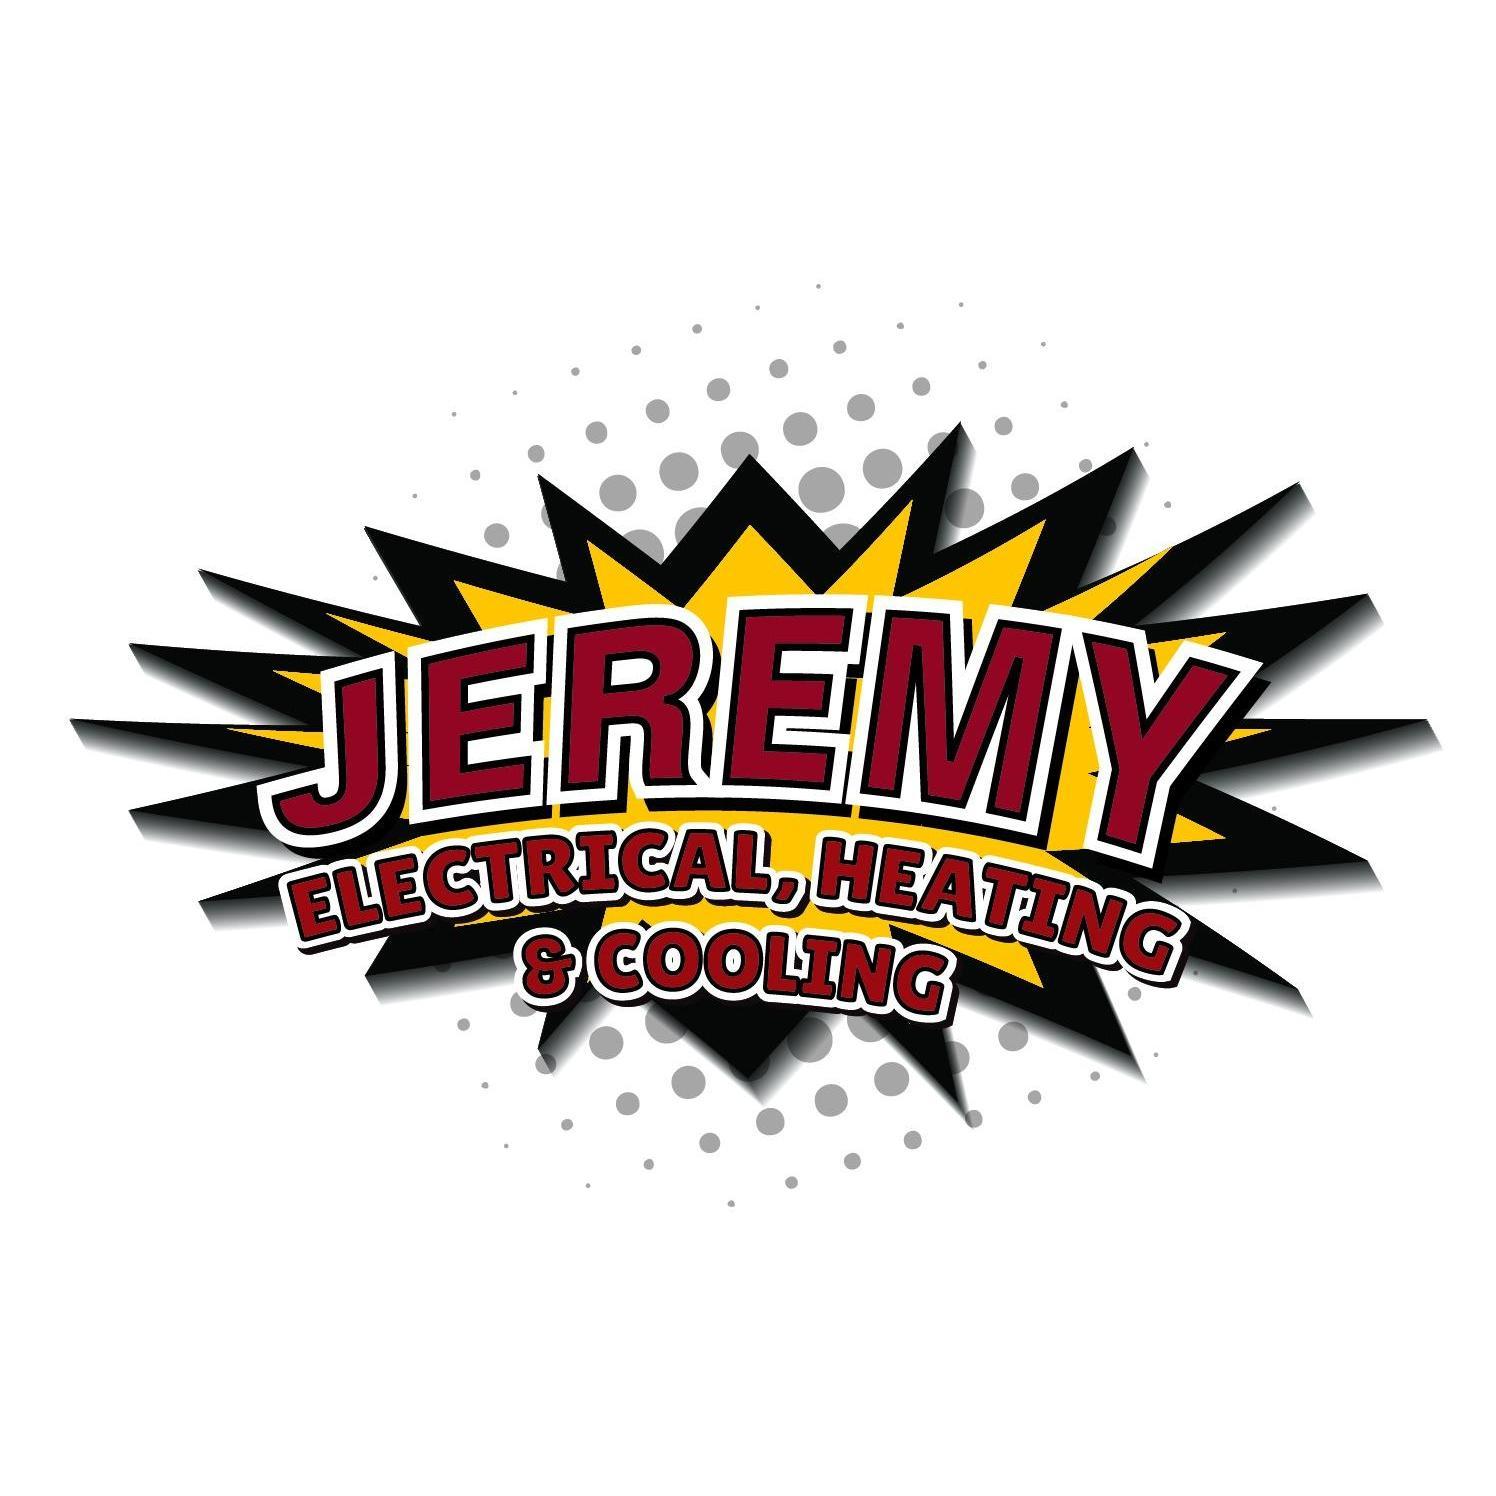 Jeremy Electrical image 10